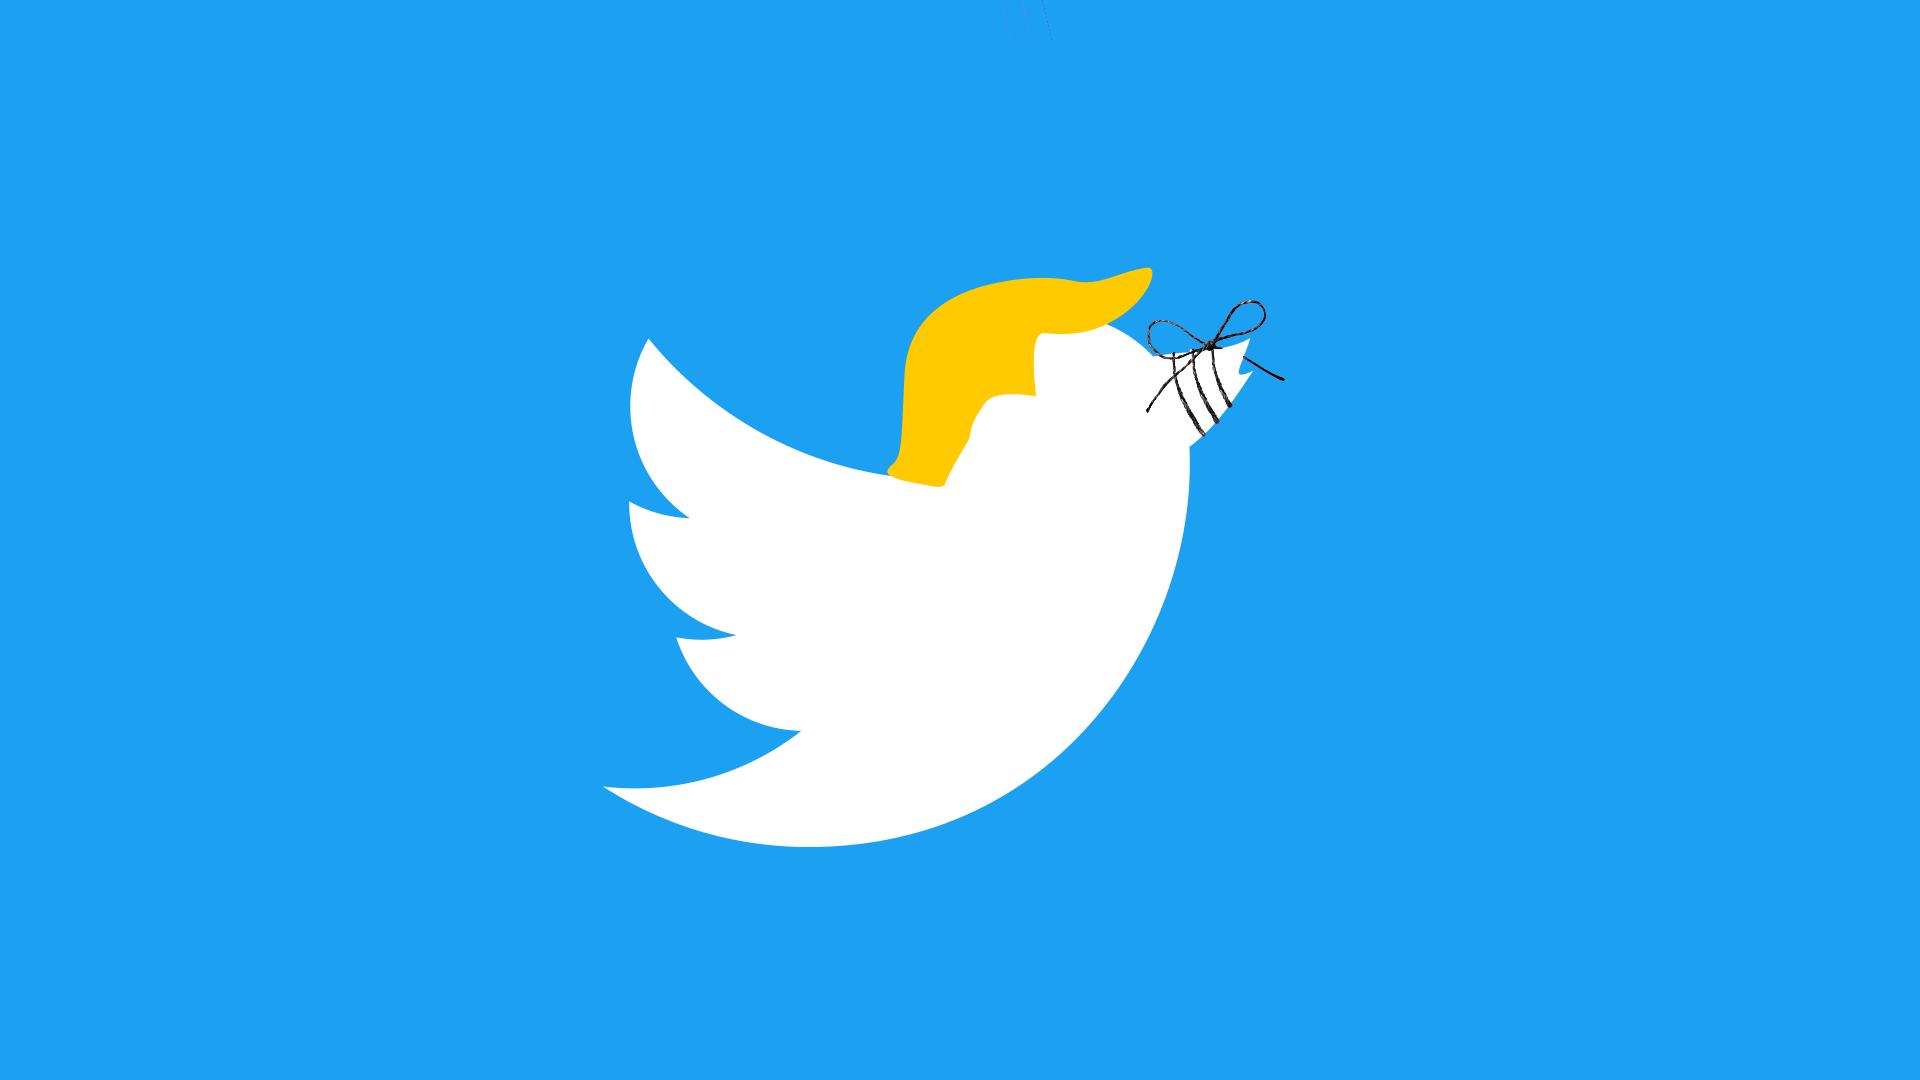 Illustration of a Trump Tweet